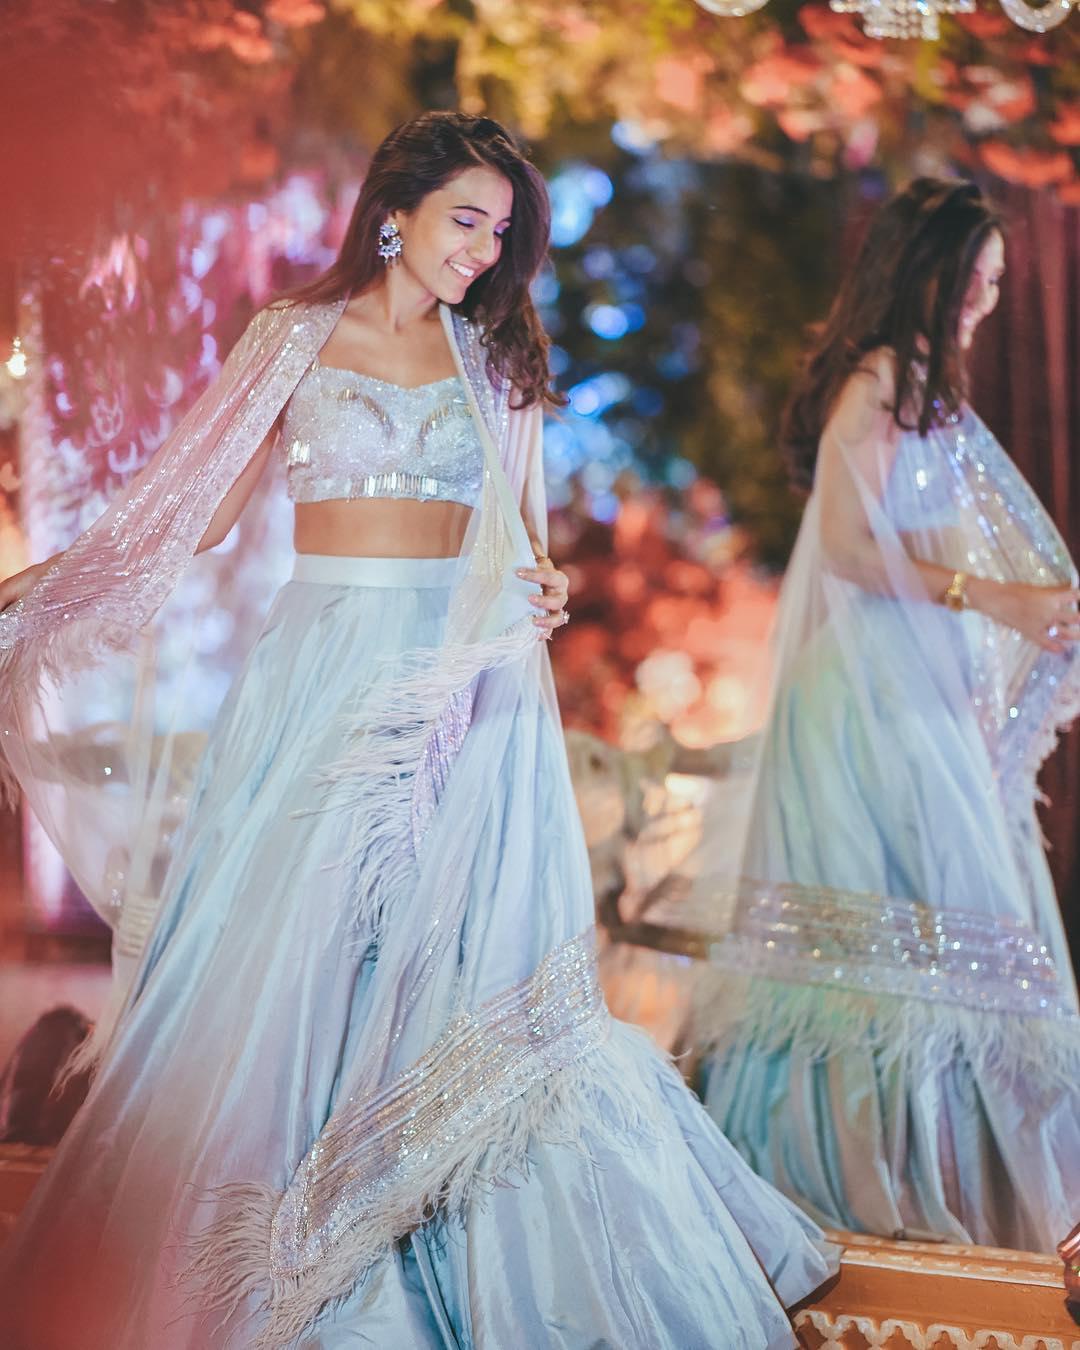 Bridal Blouse, Blouse Design, Bridal Blouse Design, Choli Design, Bridal Choli Design, Bridal Outfit, Bridal Fashion, Miss Style Fiesta, Bustier Blouse